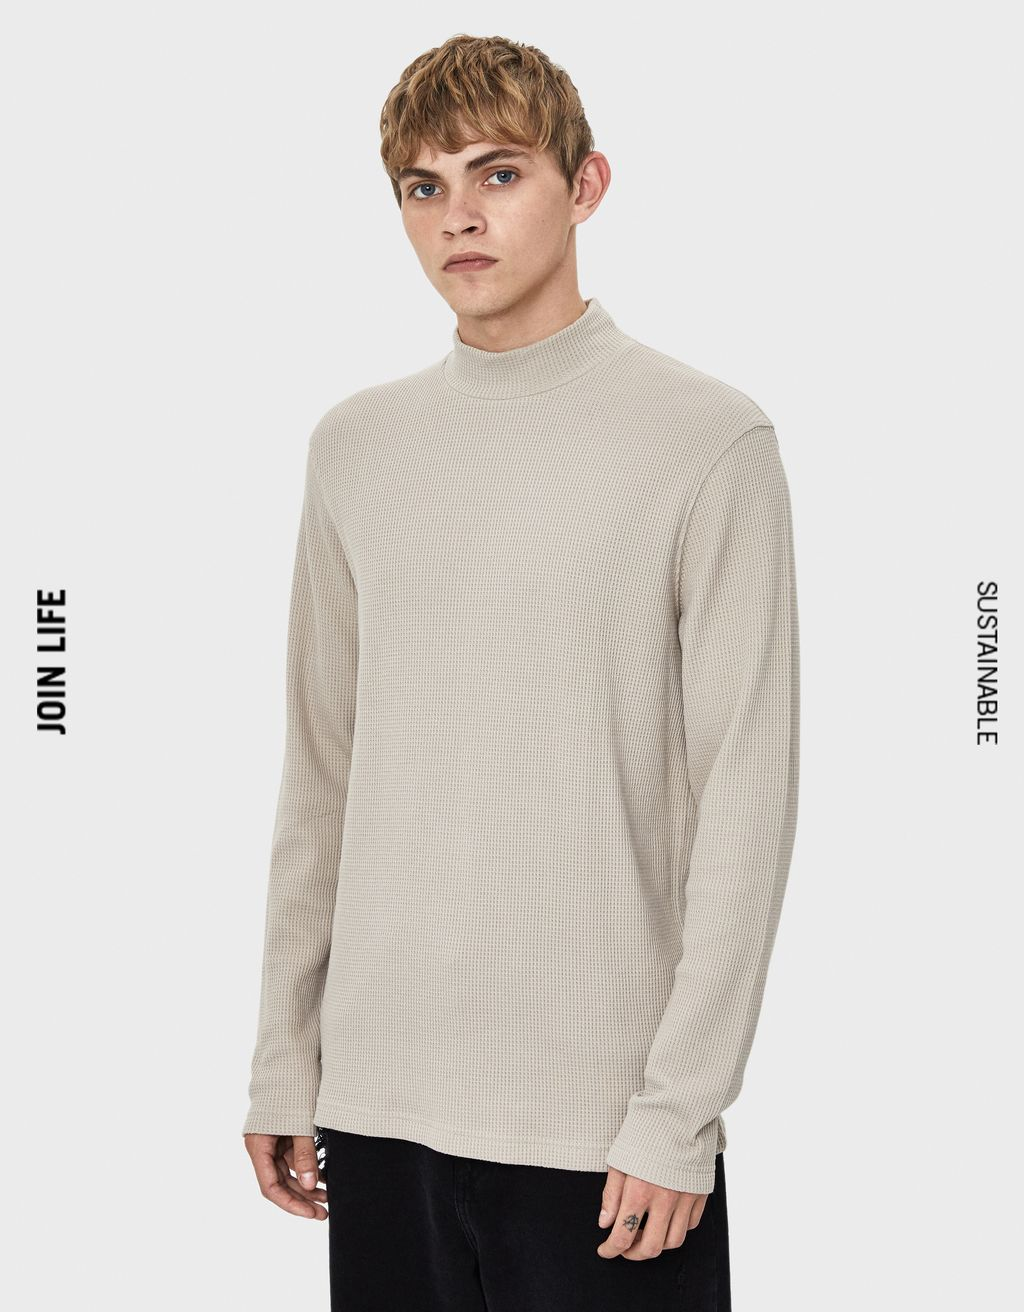 High neck waffle knit sweater